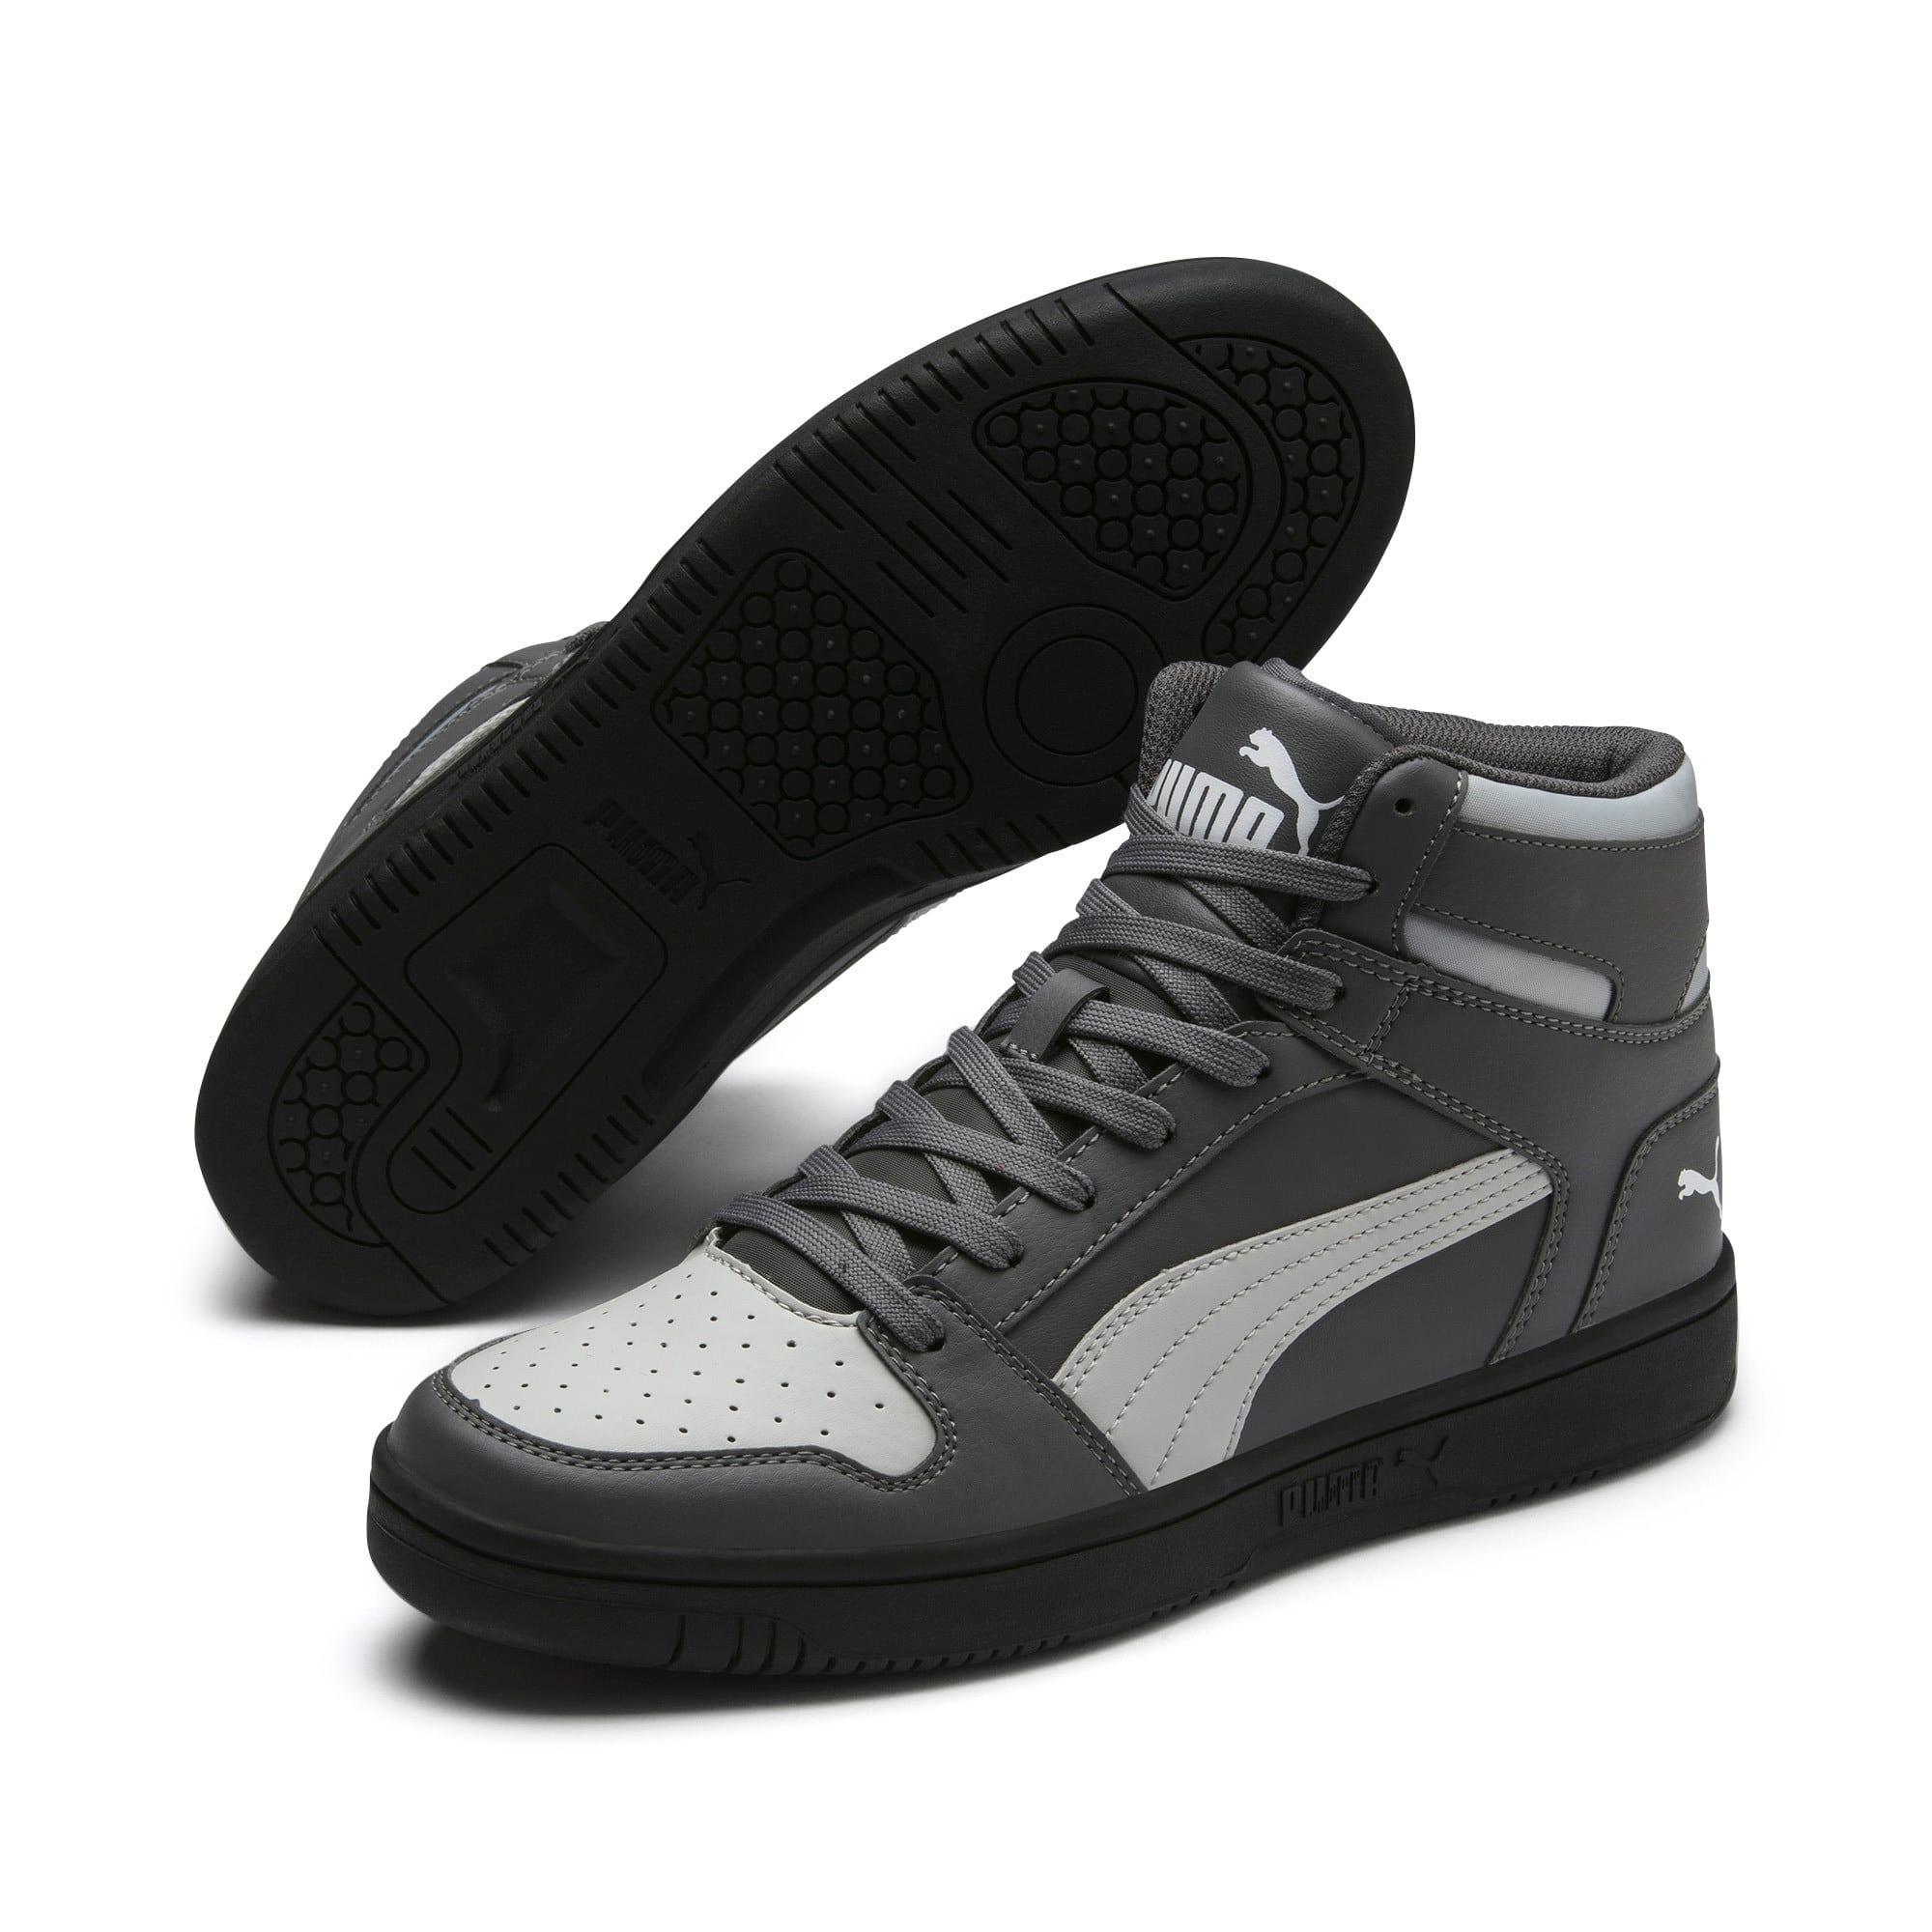 Thumbnail 2 of PUMA Rebound LayUp Sneakers, CASTLEROCK-HRise-White-Black, medium